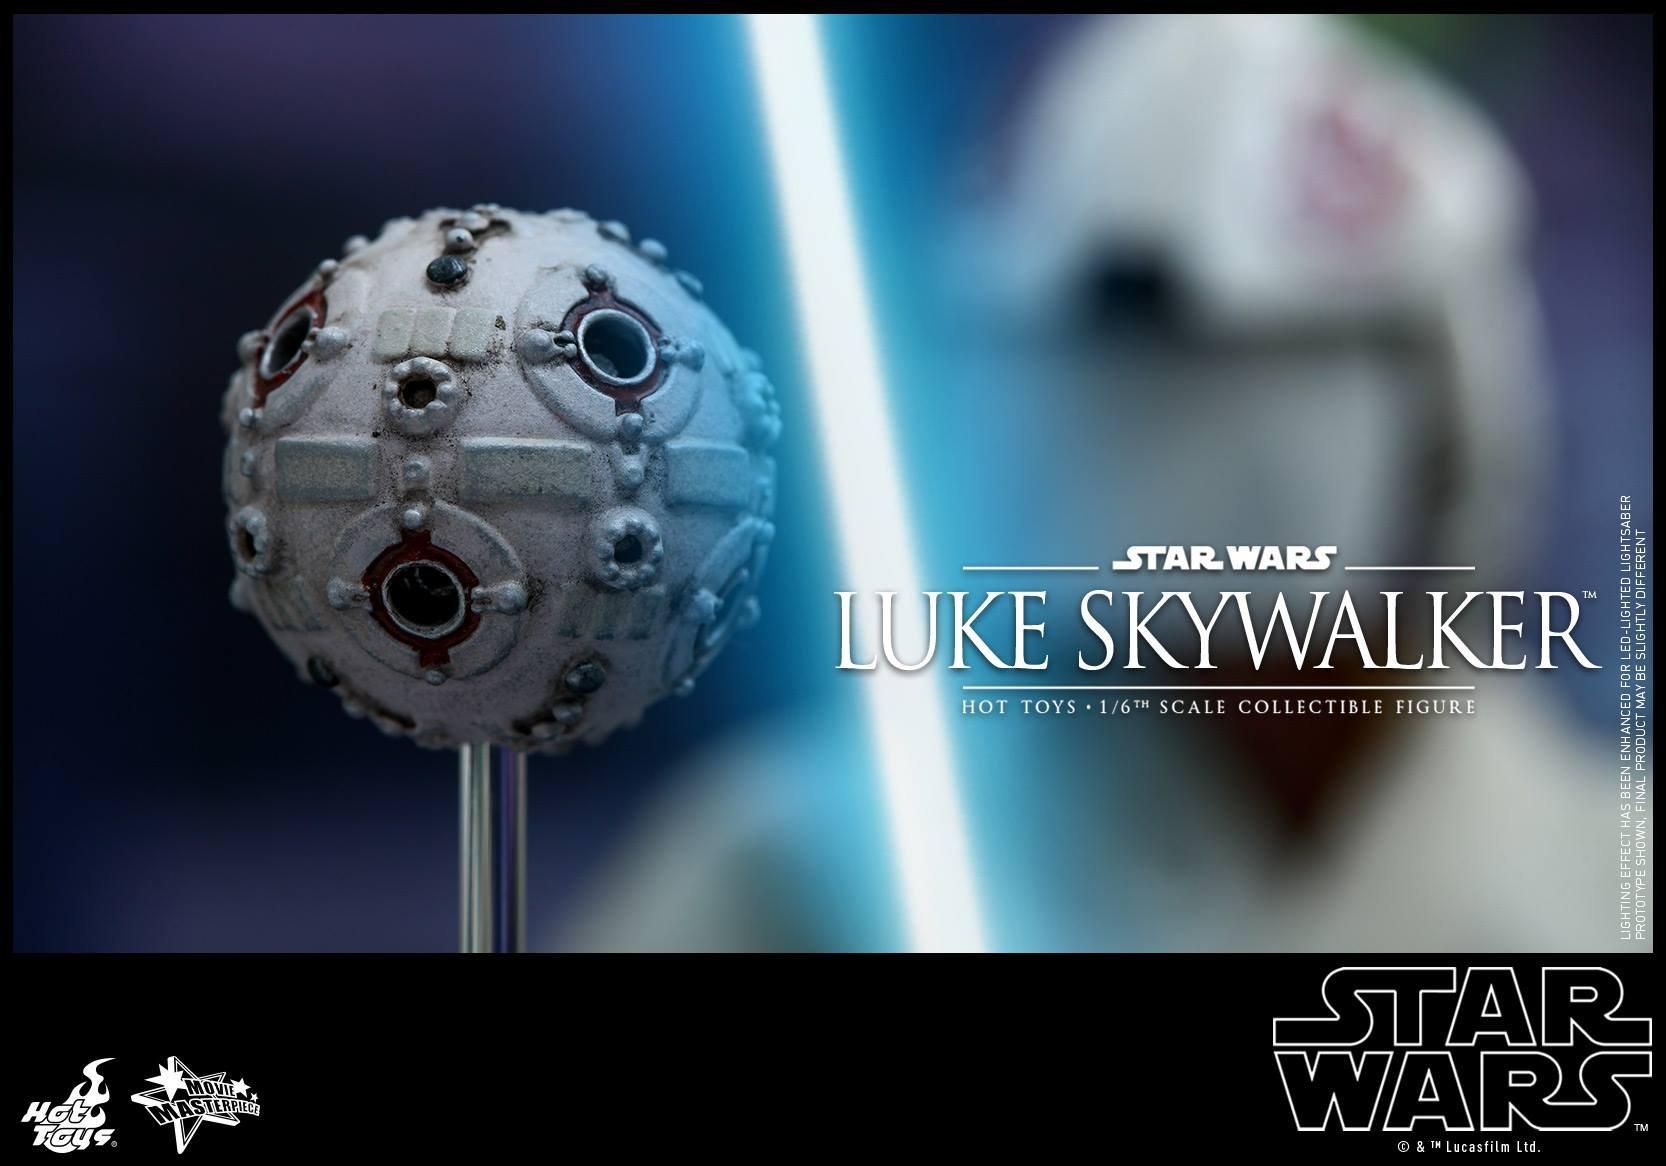 Star Wars Sci Fi Action Fighting Futuristic Series Adventure Disney Poster Wallpaper 1666x1166 933367 Wallpaperup